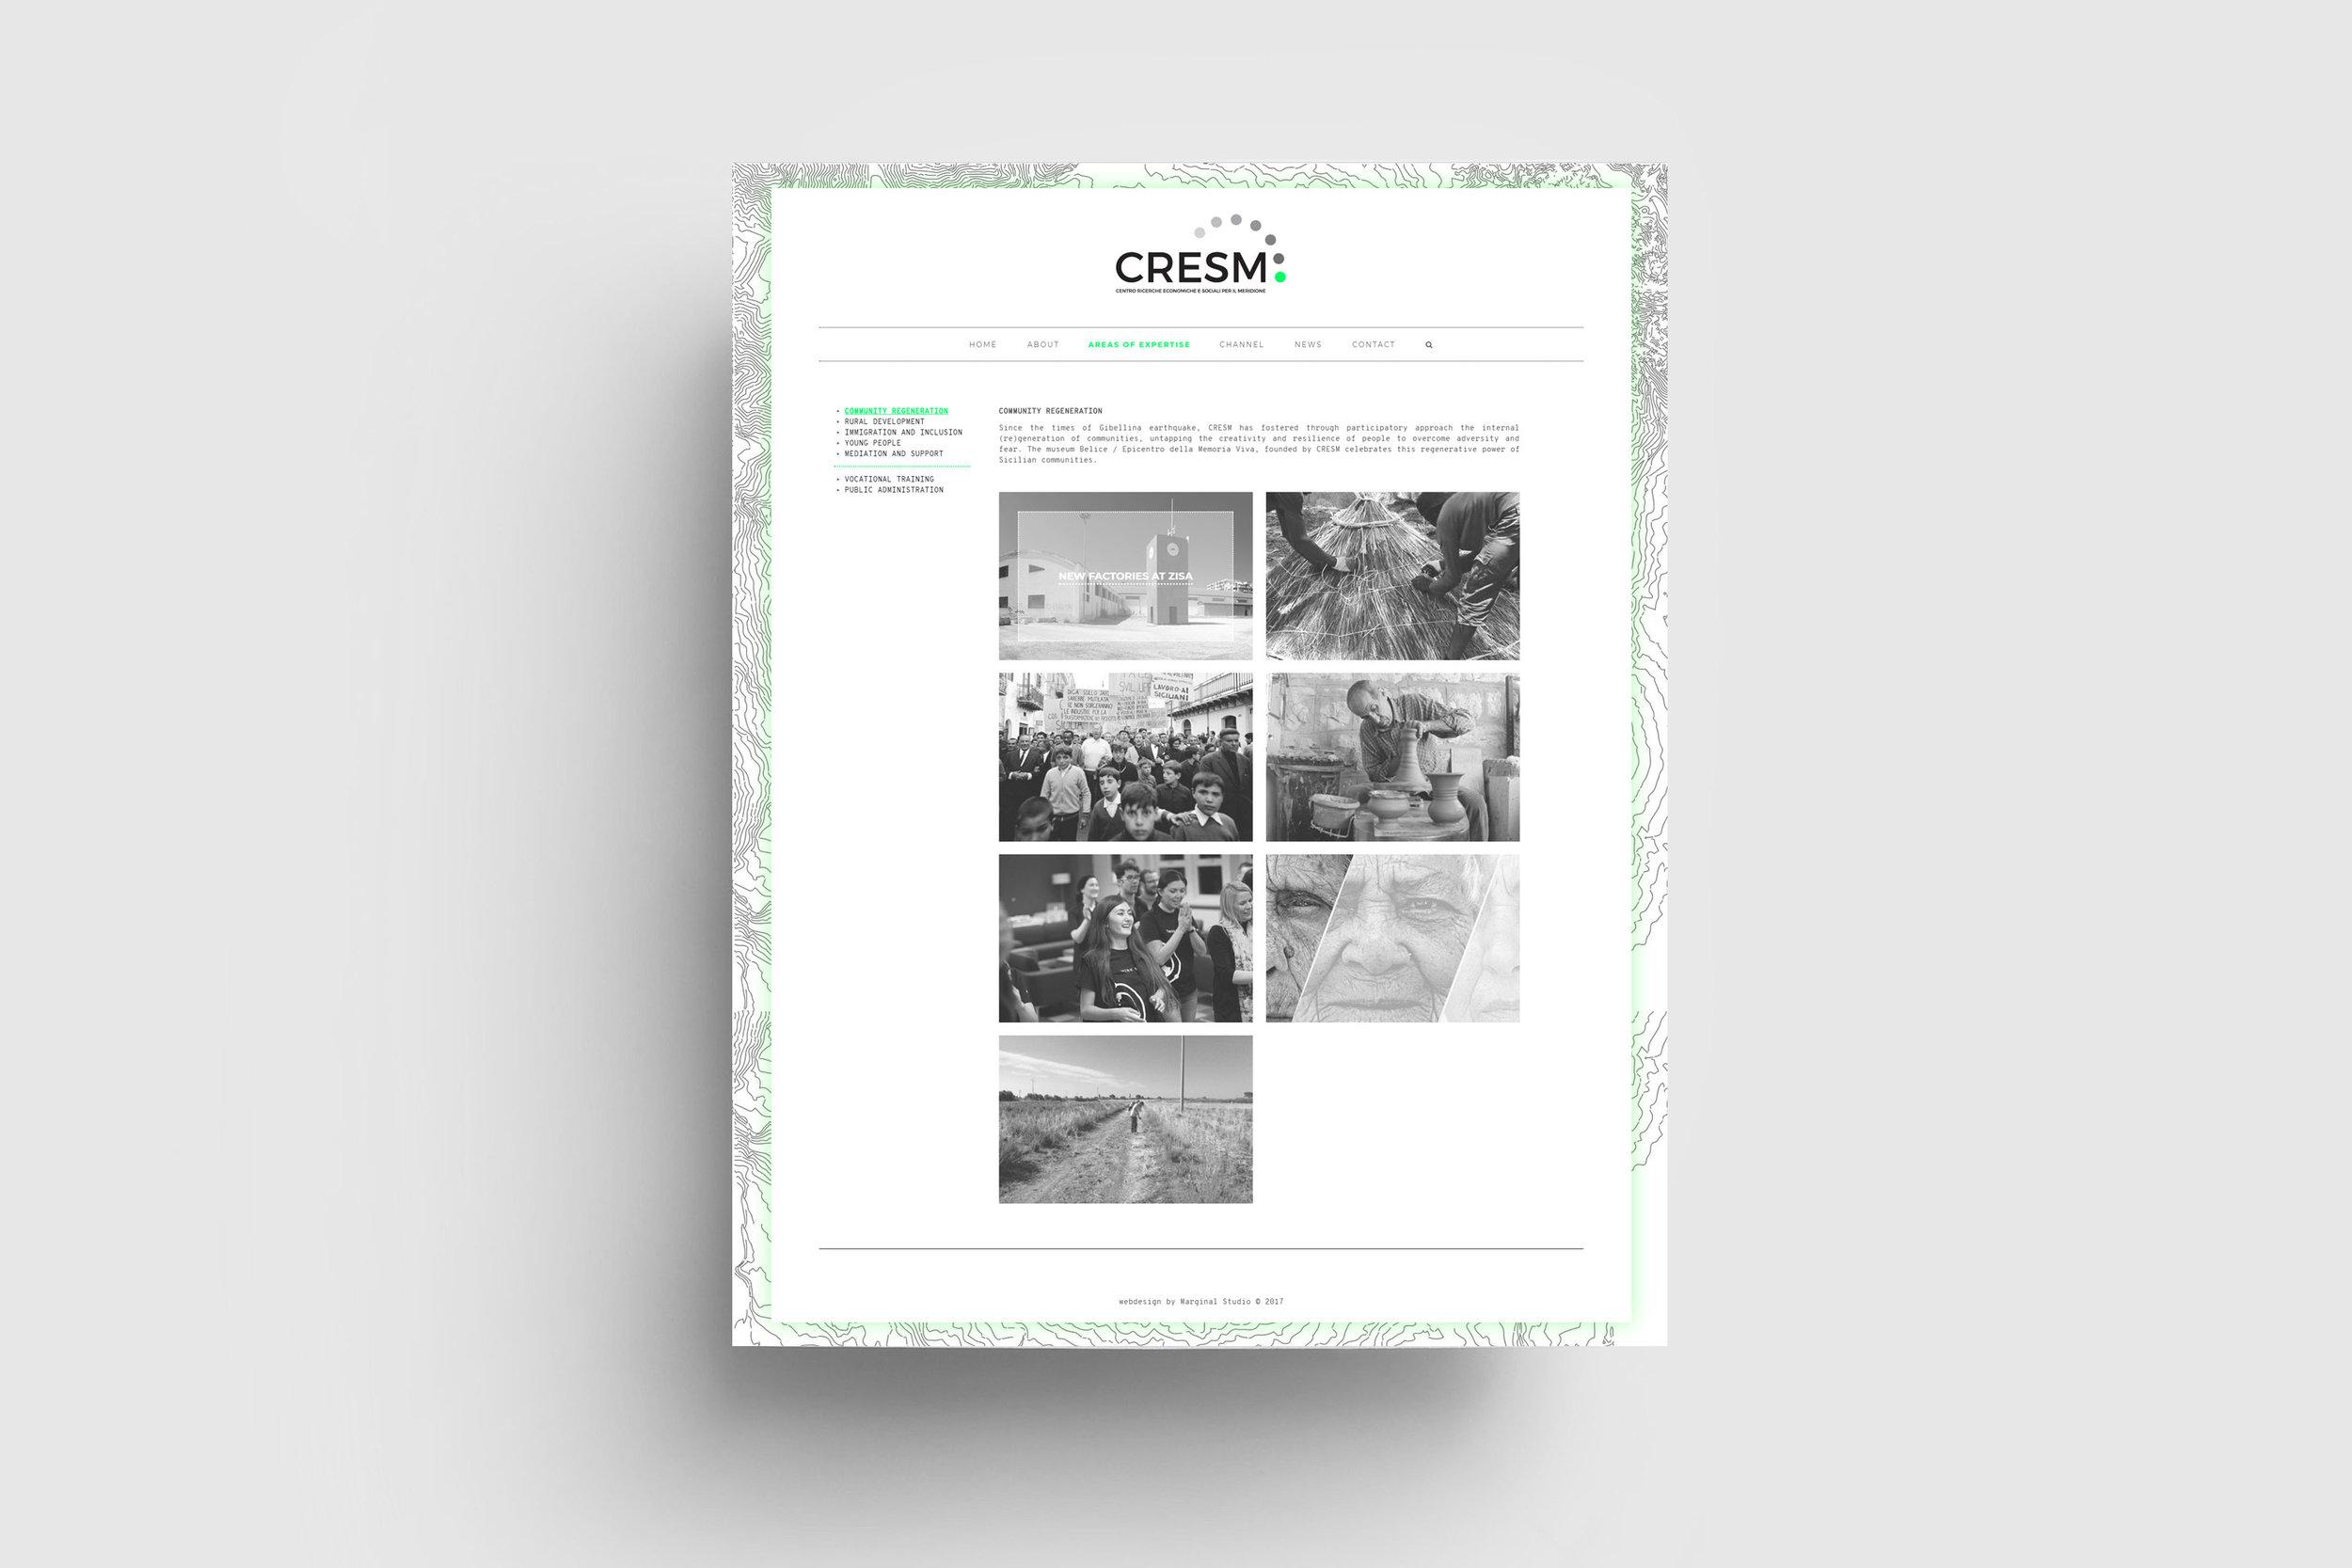 Cresm_DESKTOP - Category.jpg